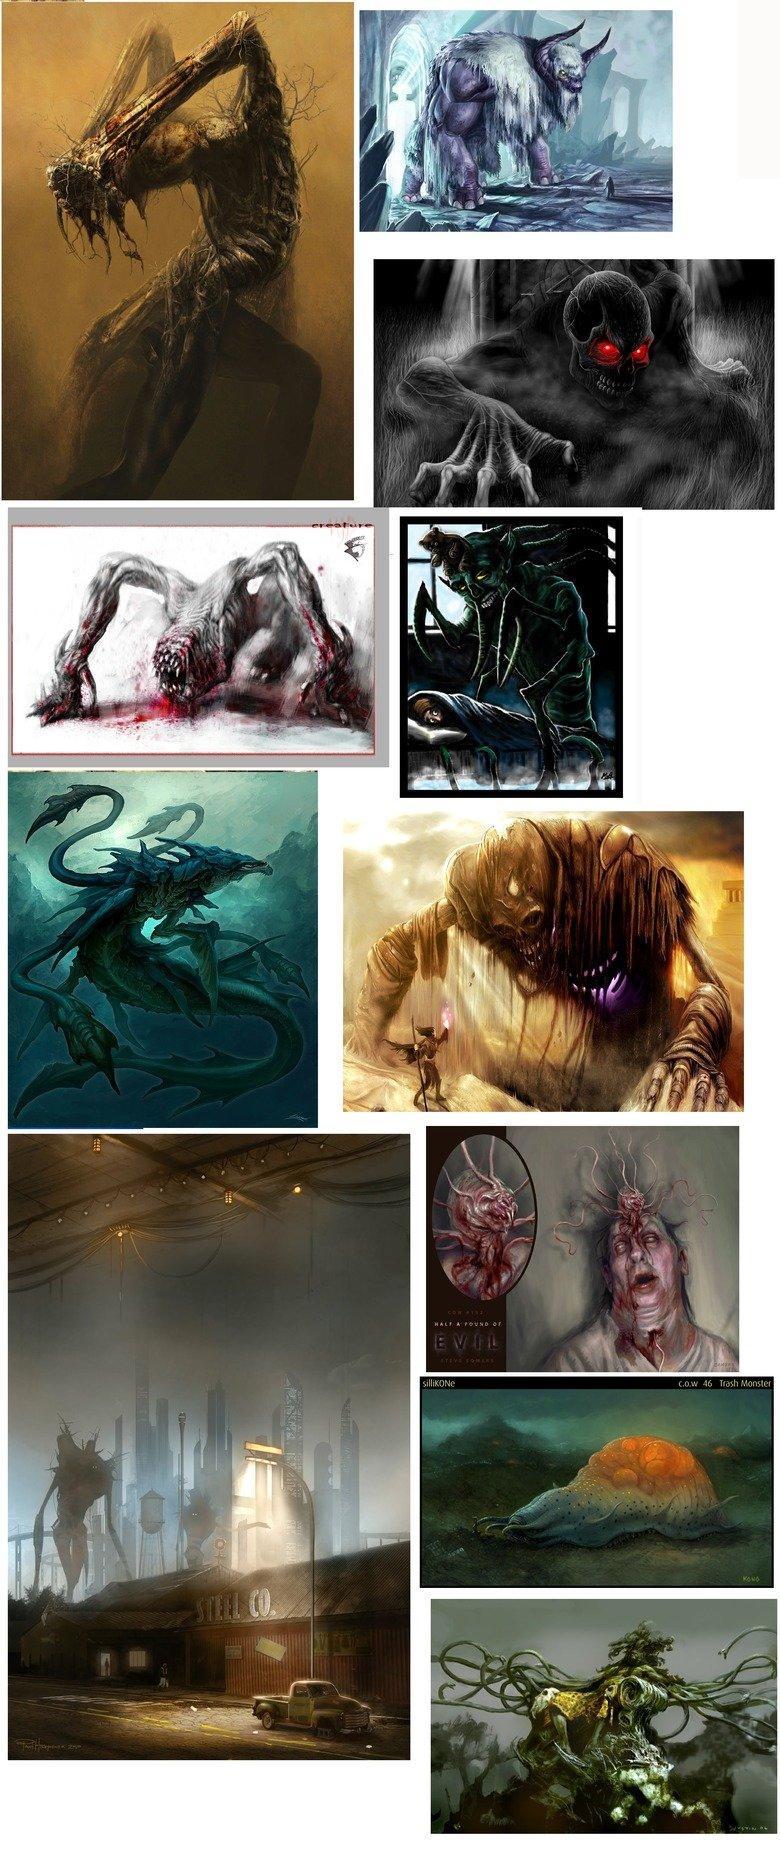 Epic Monster Comp 2 of 9. Enlarge Part 1 /channel/morbid-channel/Epic+Monsters+Comps+1+of+9/rYdTGeL/.. bring em on monster morbid